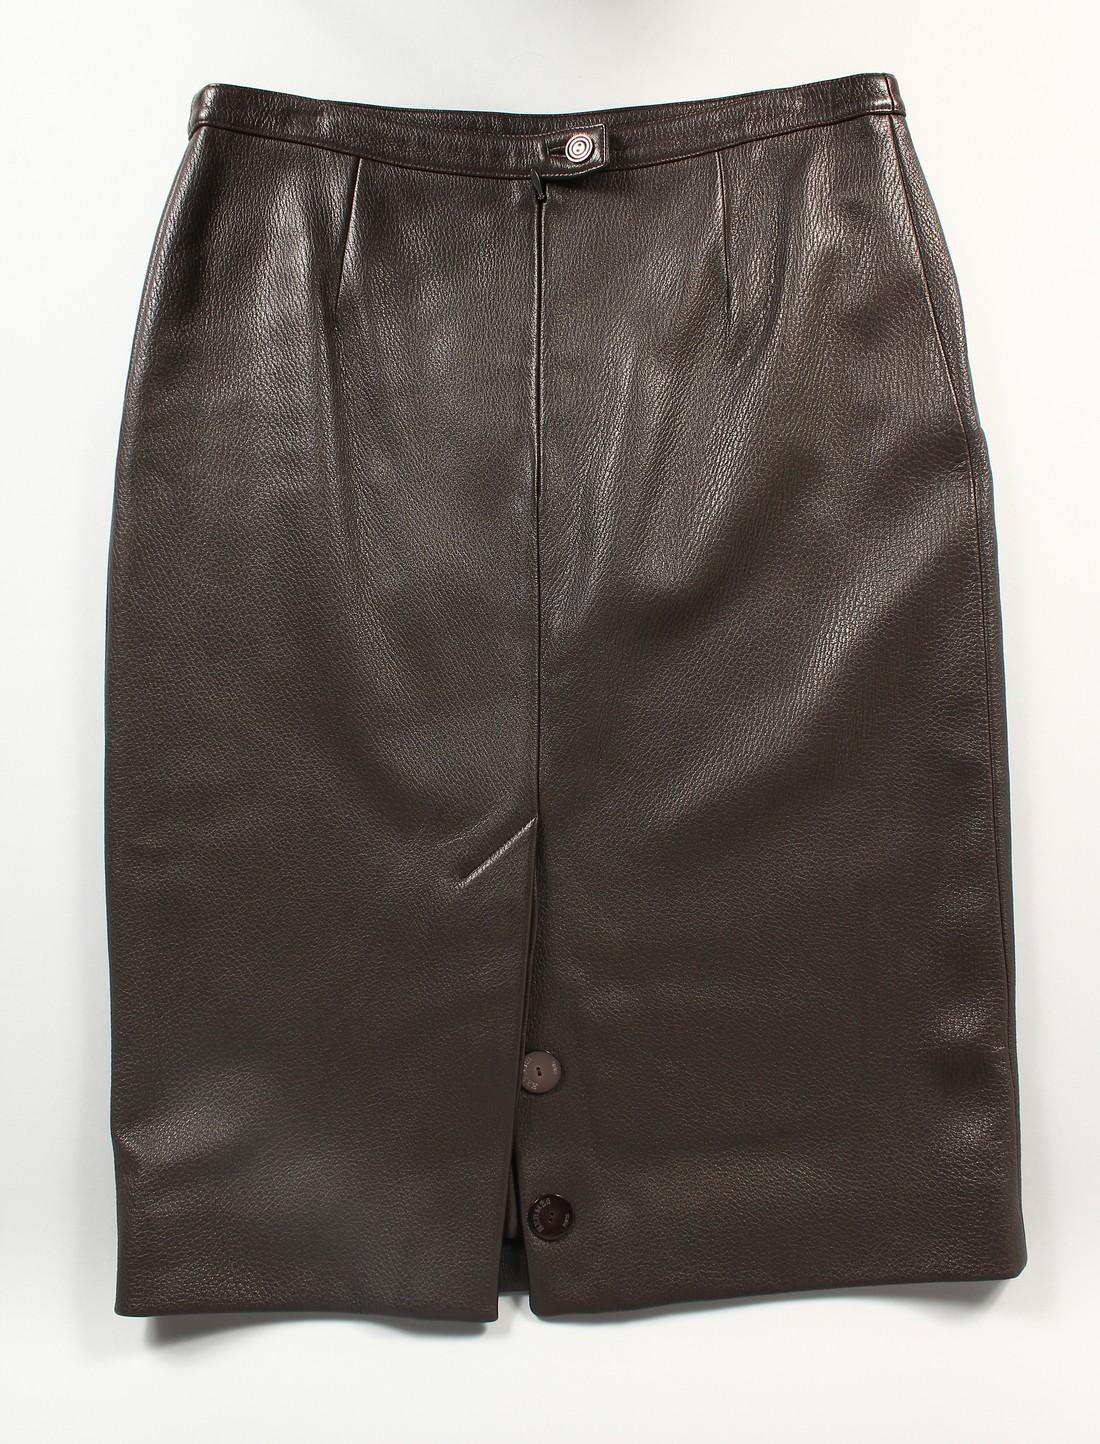 A HERMES LEATHER SKIRT, never worn.